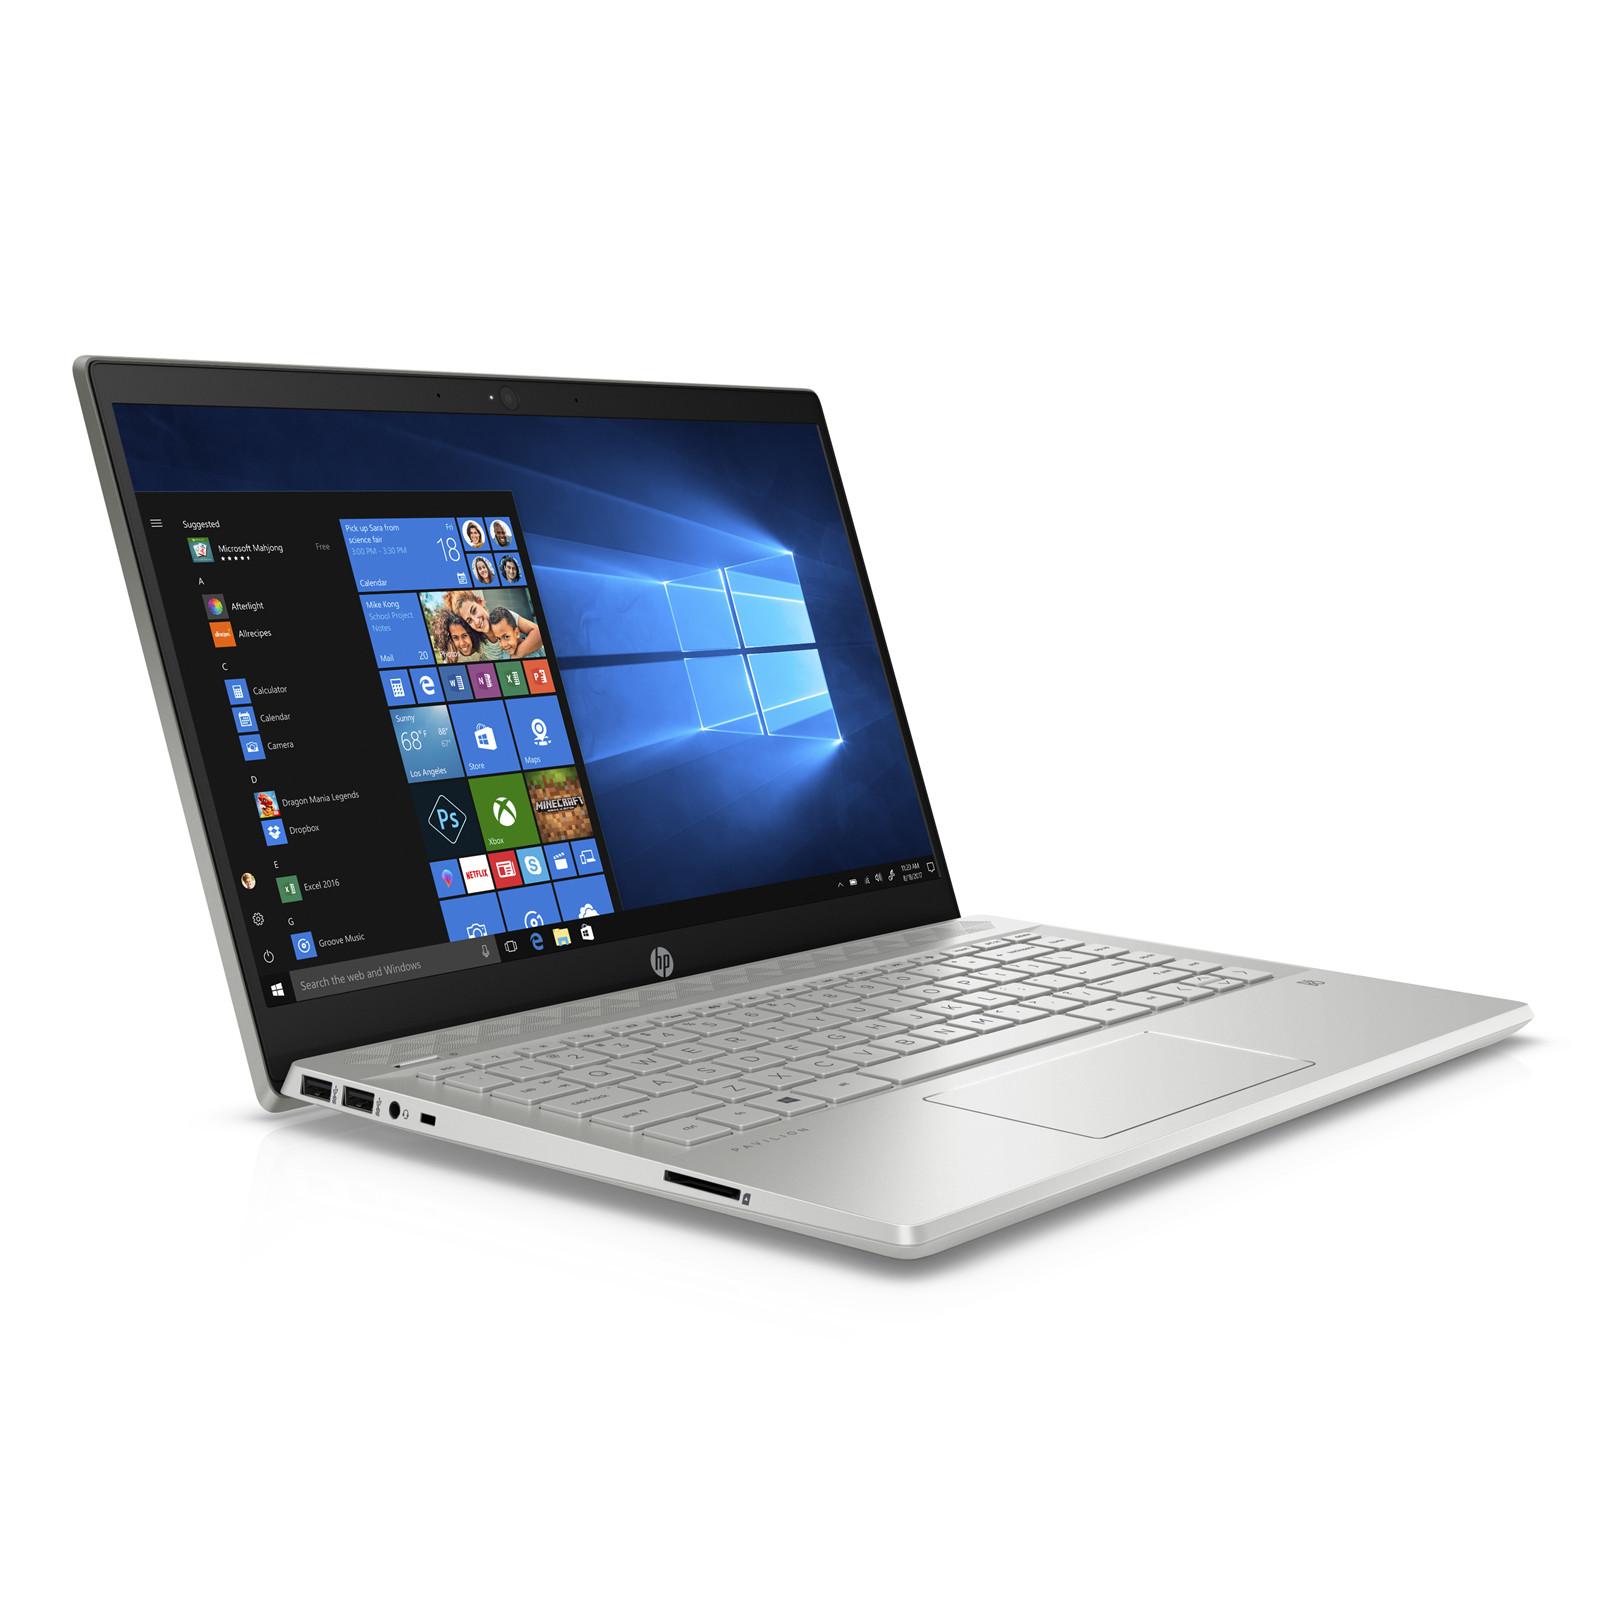 Buy the HP Pavilion 14-ce0000TU Laptop 14